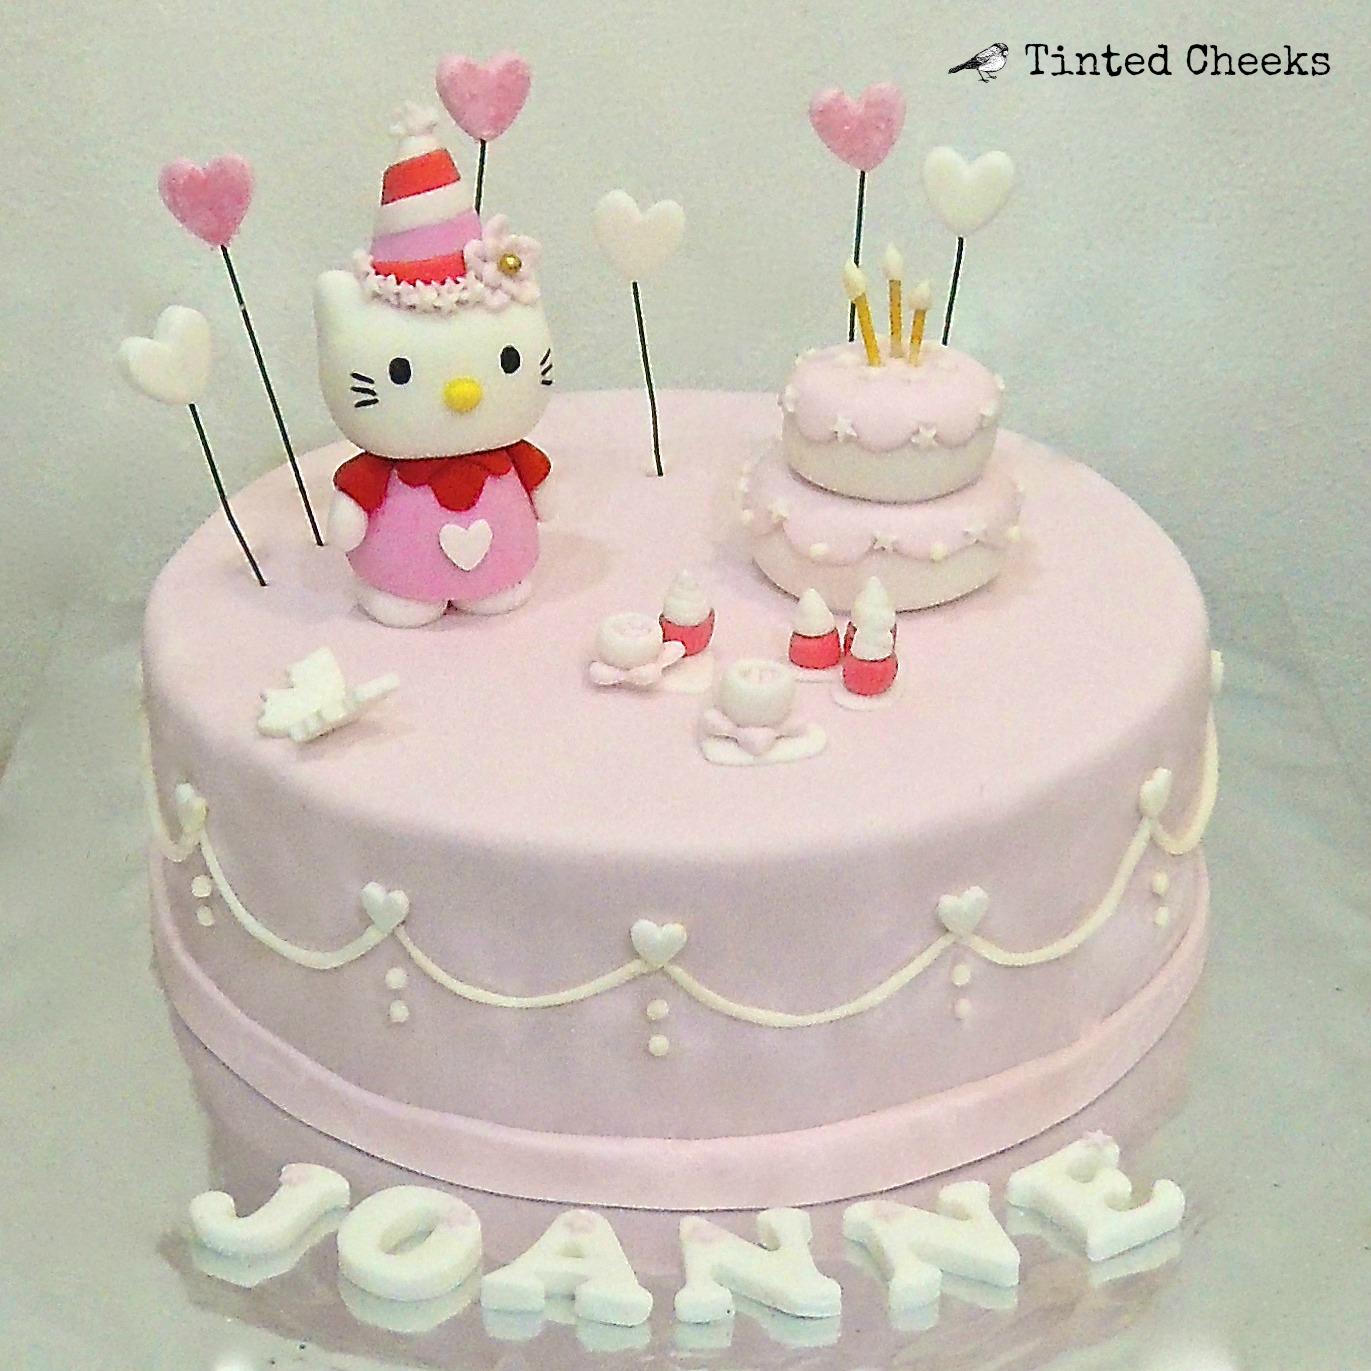 Hello Kitty Miniature Desserts Cake.jpg